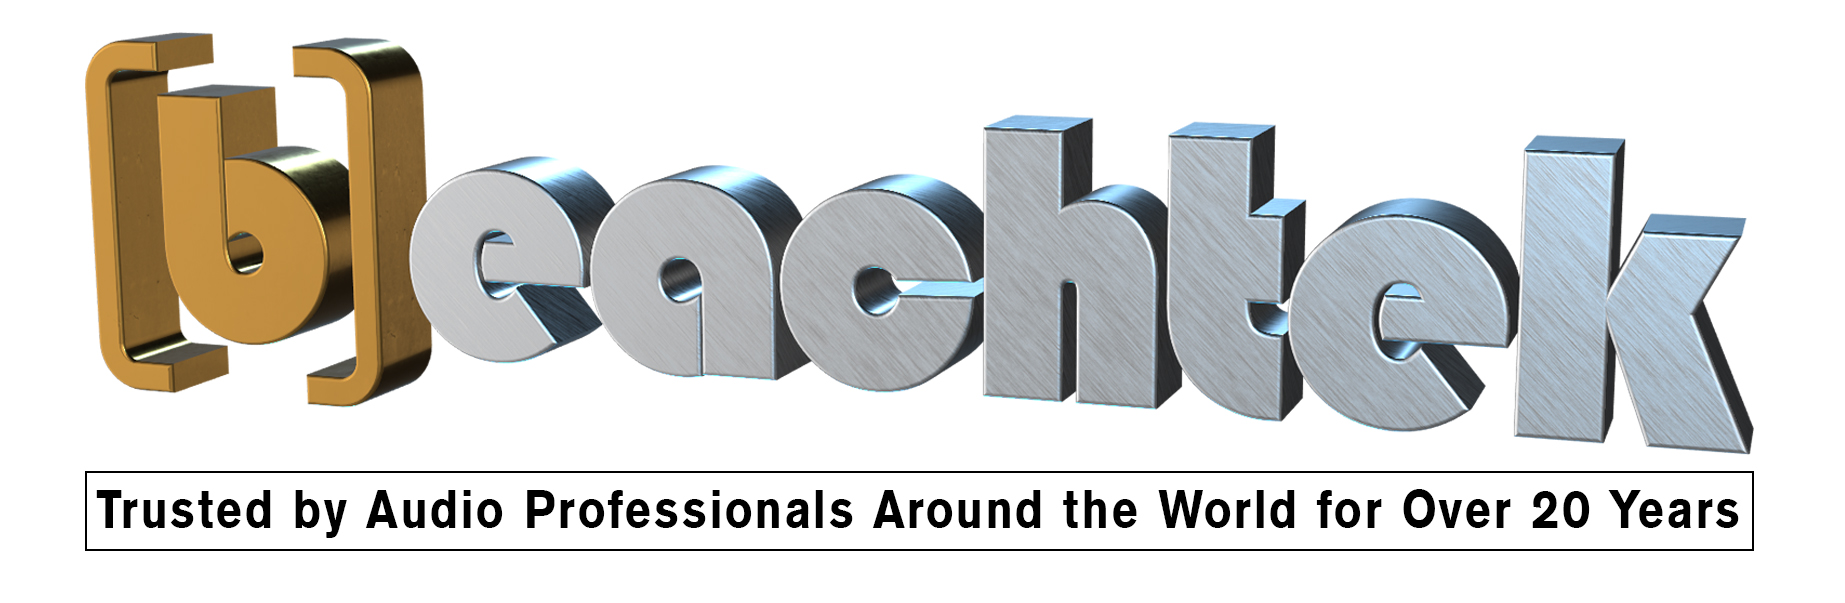 02_beachtek-3d-logo